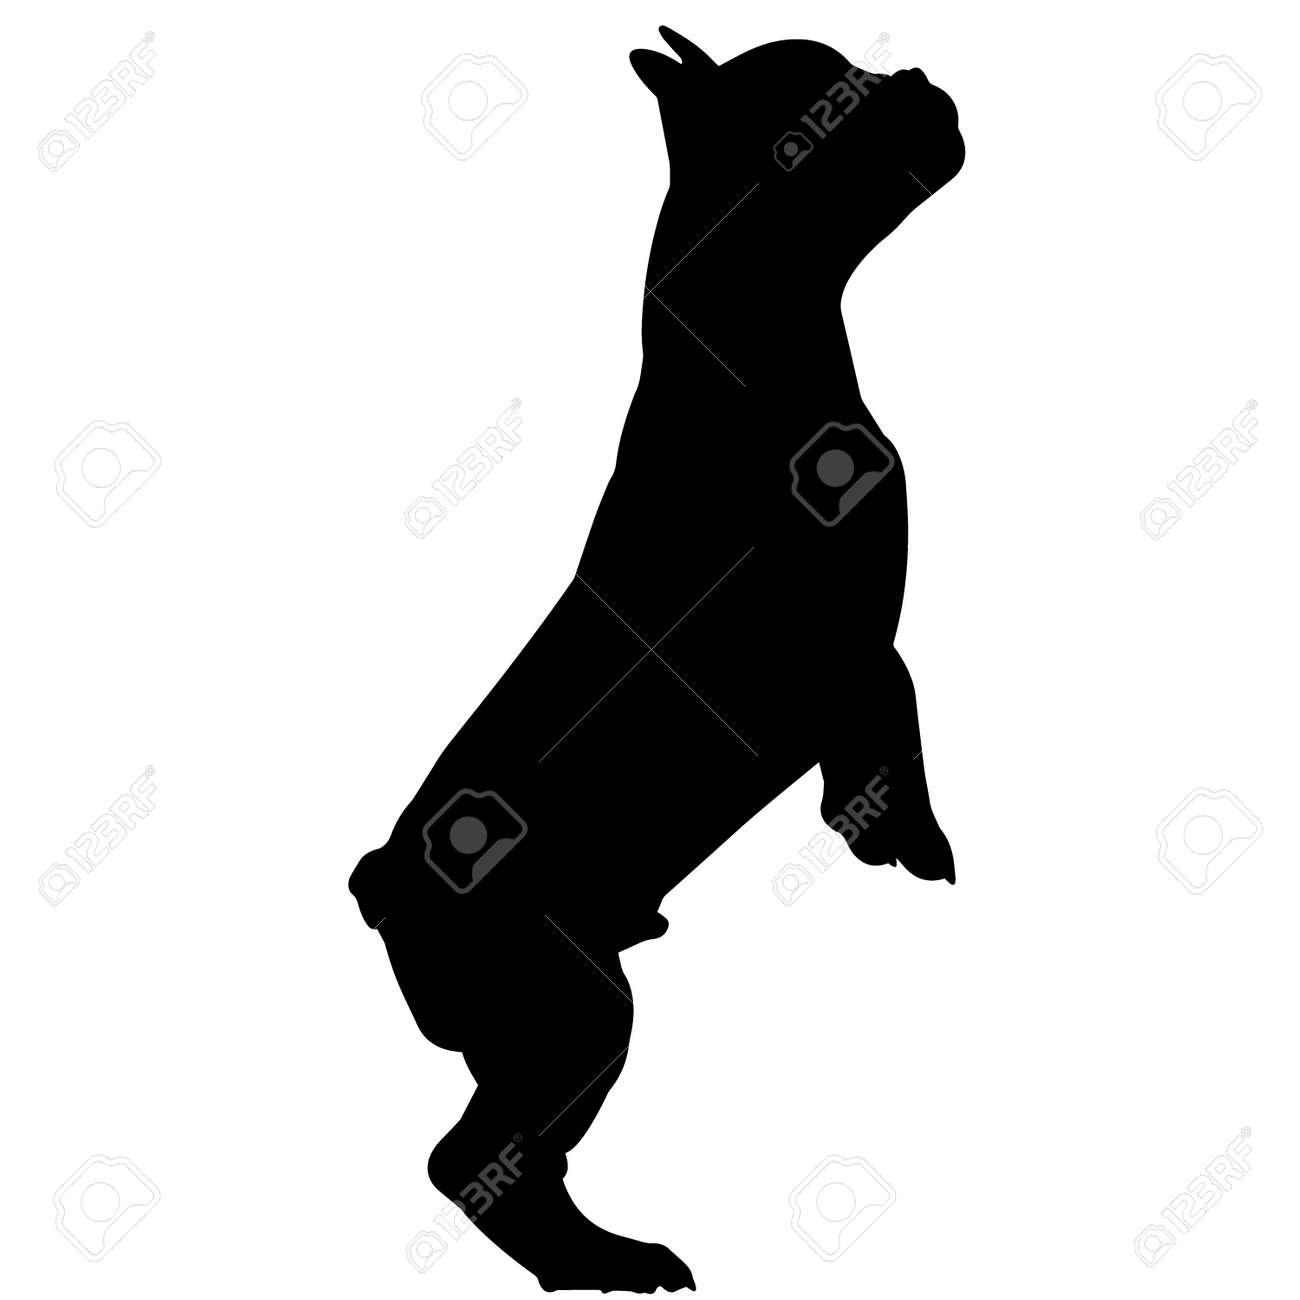 French Bulldog Dog Silhouette Vector Graphics - 157967644